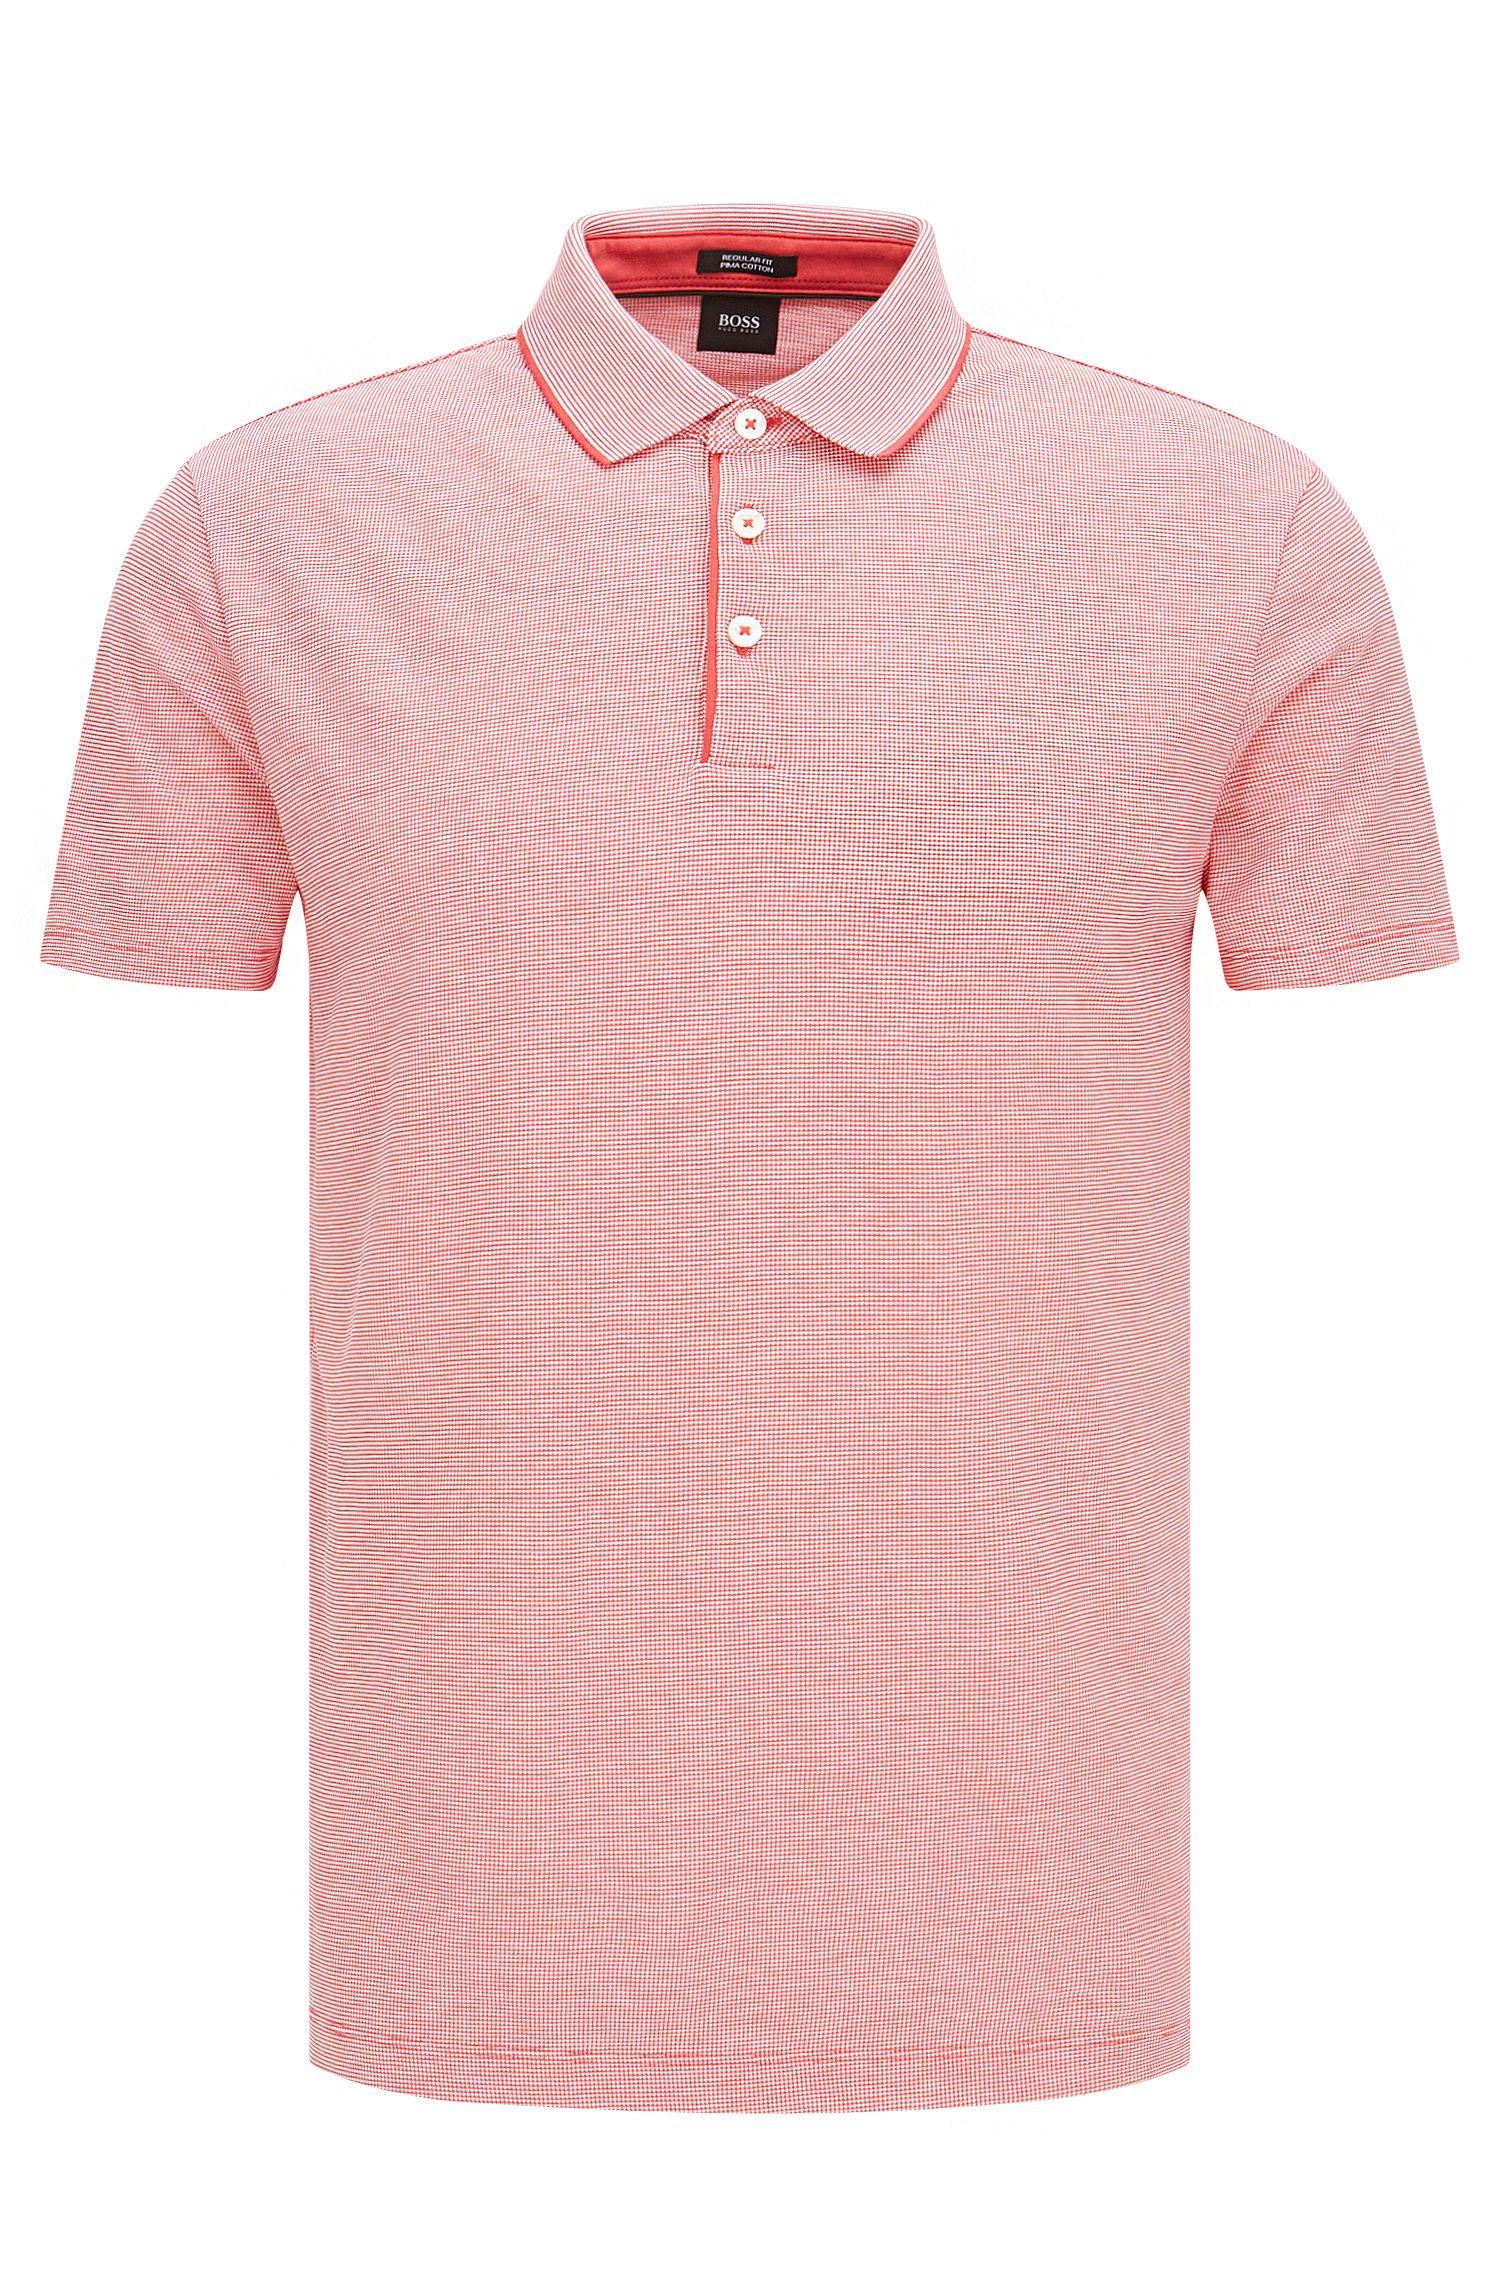 'Pack 09' | Regular Fit, Pima Cotton Polo Shirt